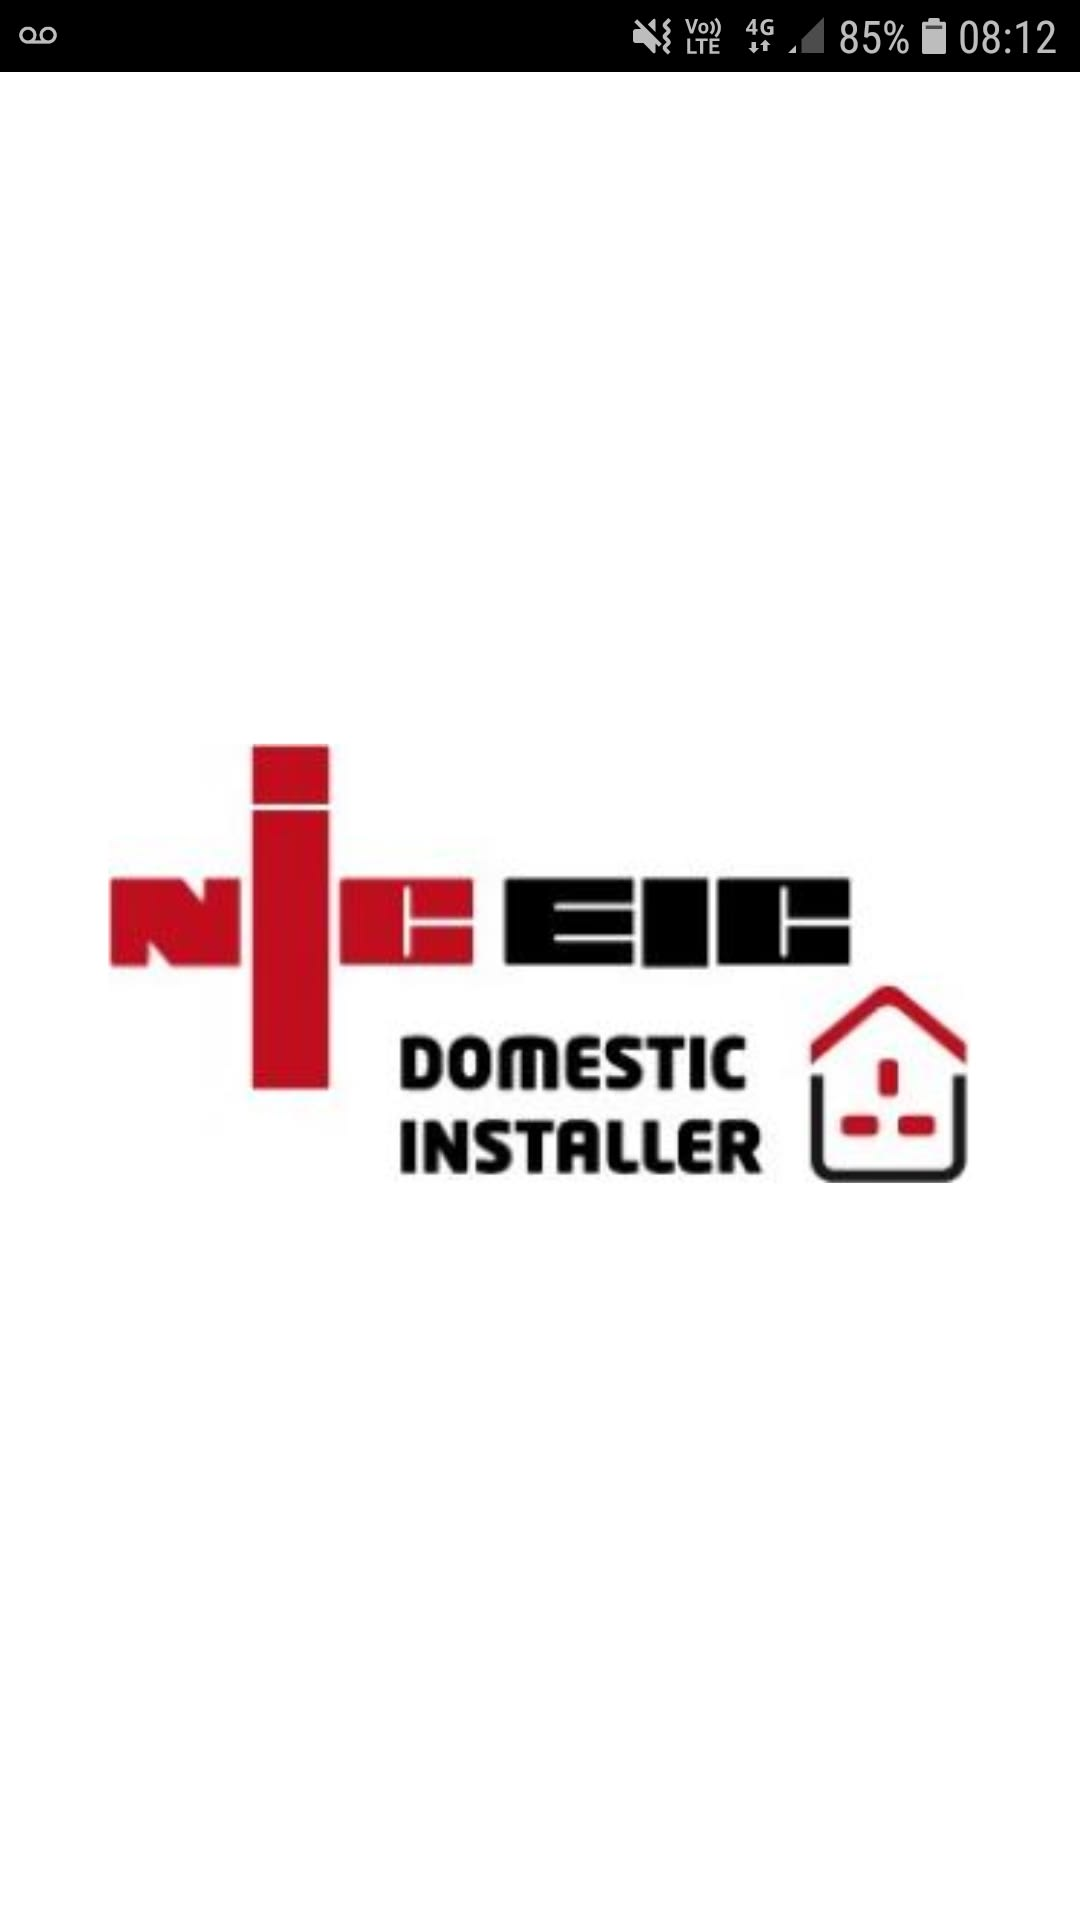 Jamie Jago Electrical Installations | 65 Chapel St, Peterborough PE2 8JE | +44 7706 116183